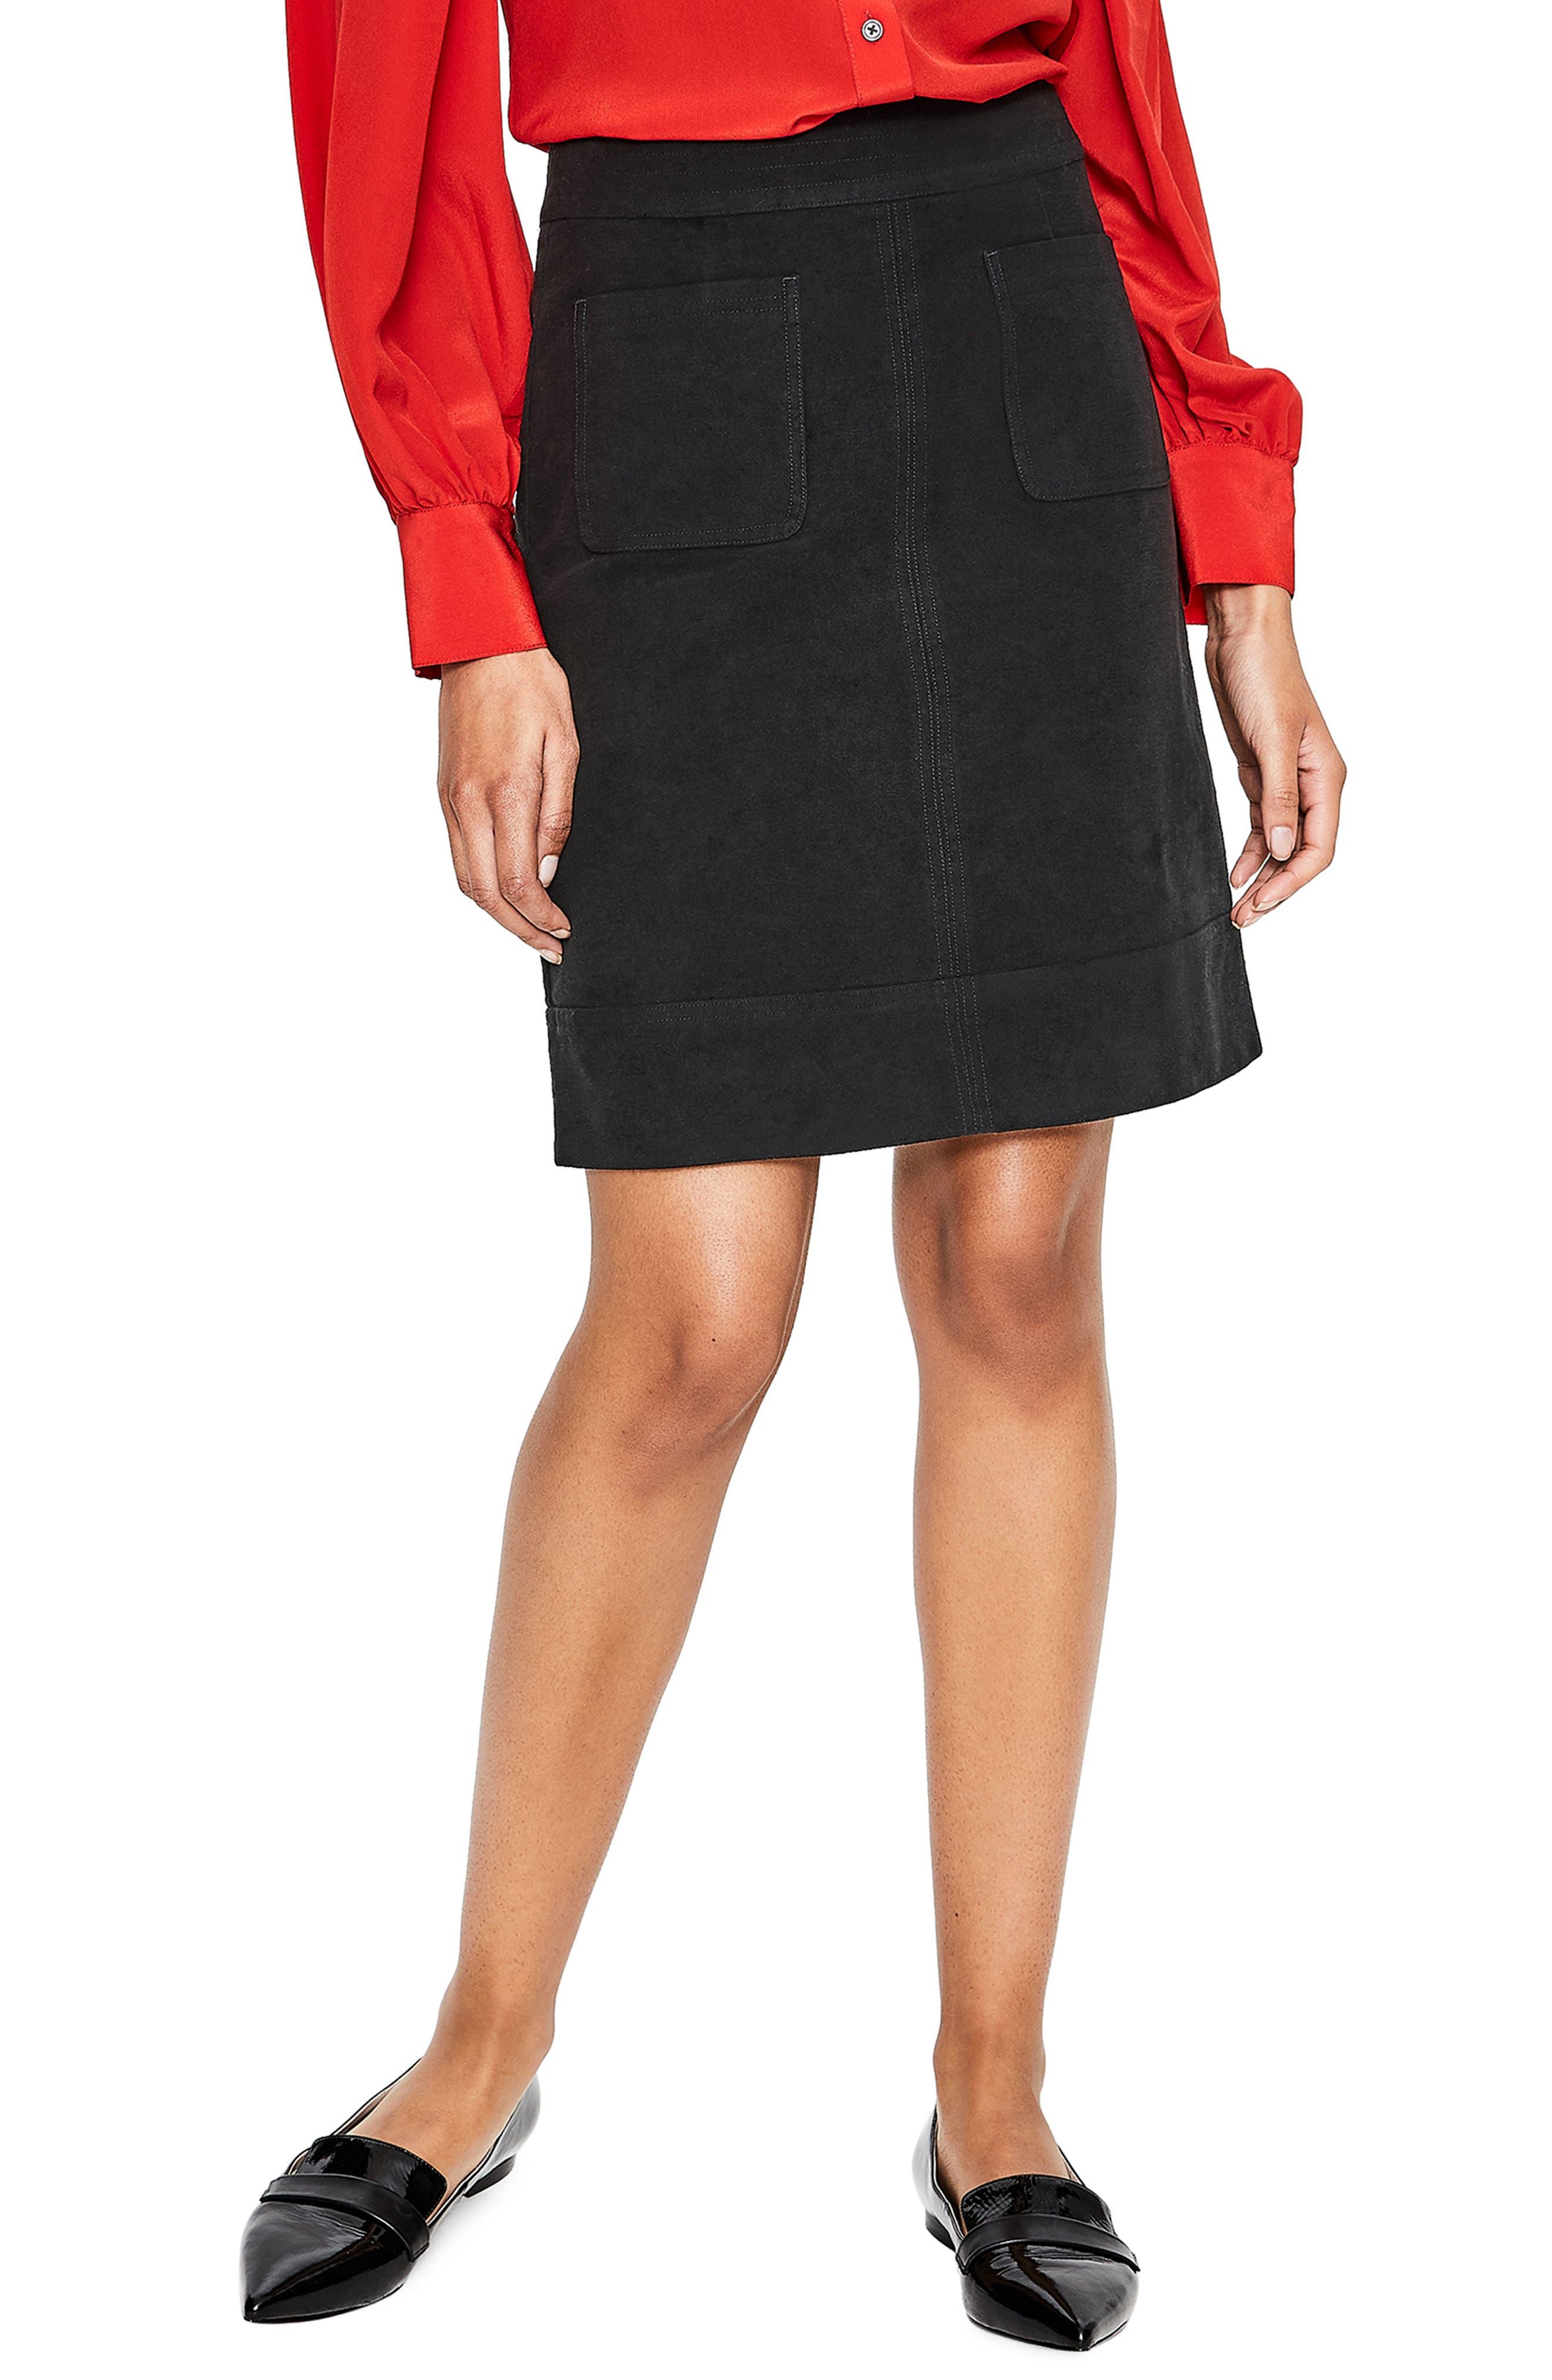 Boden Dorchester Patch Pocket Stretch Cotton Miniskirt, 8 (similar to 16W-18W) - Black